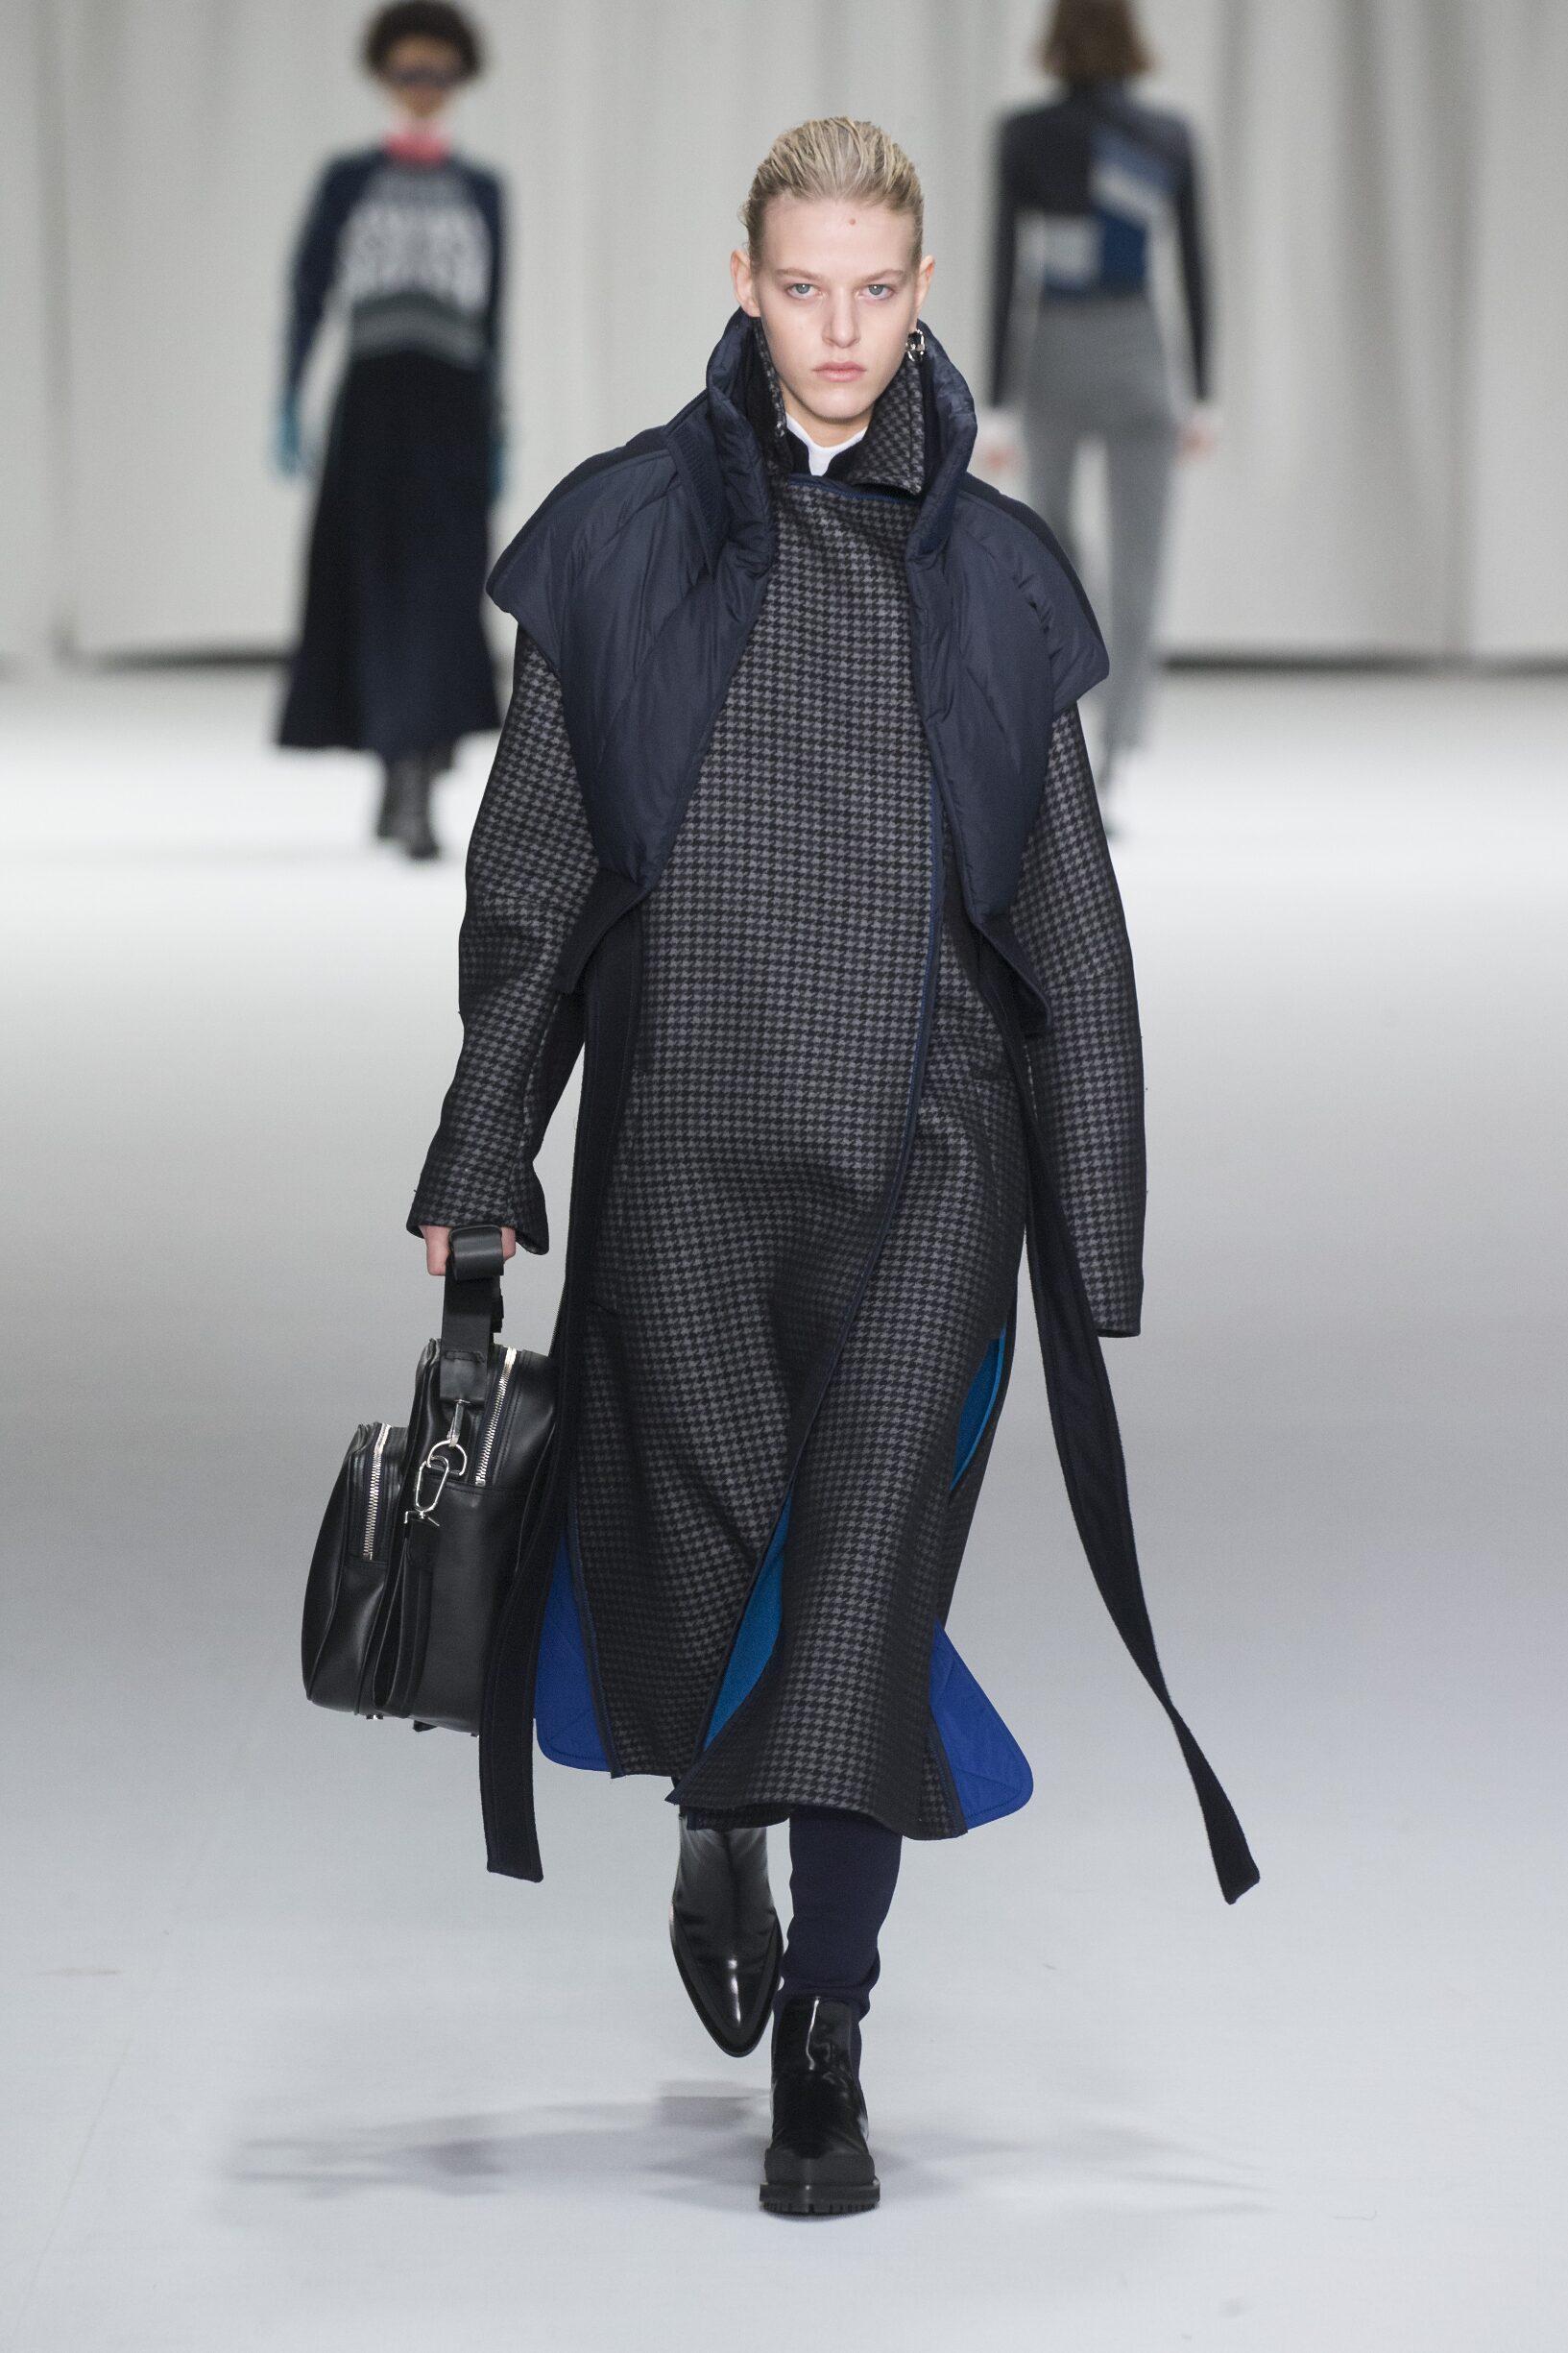 Fall Fashion Woman Trends 2018 Sportmax